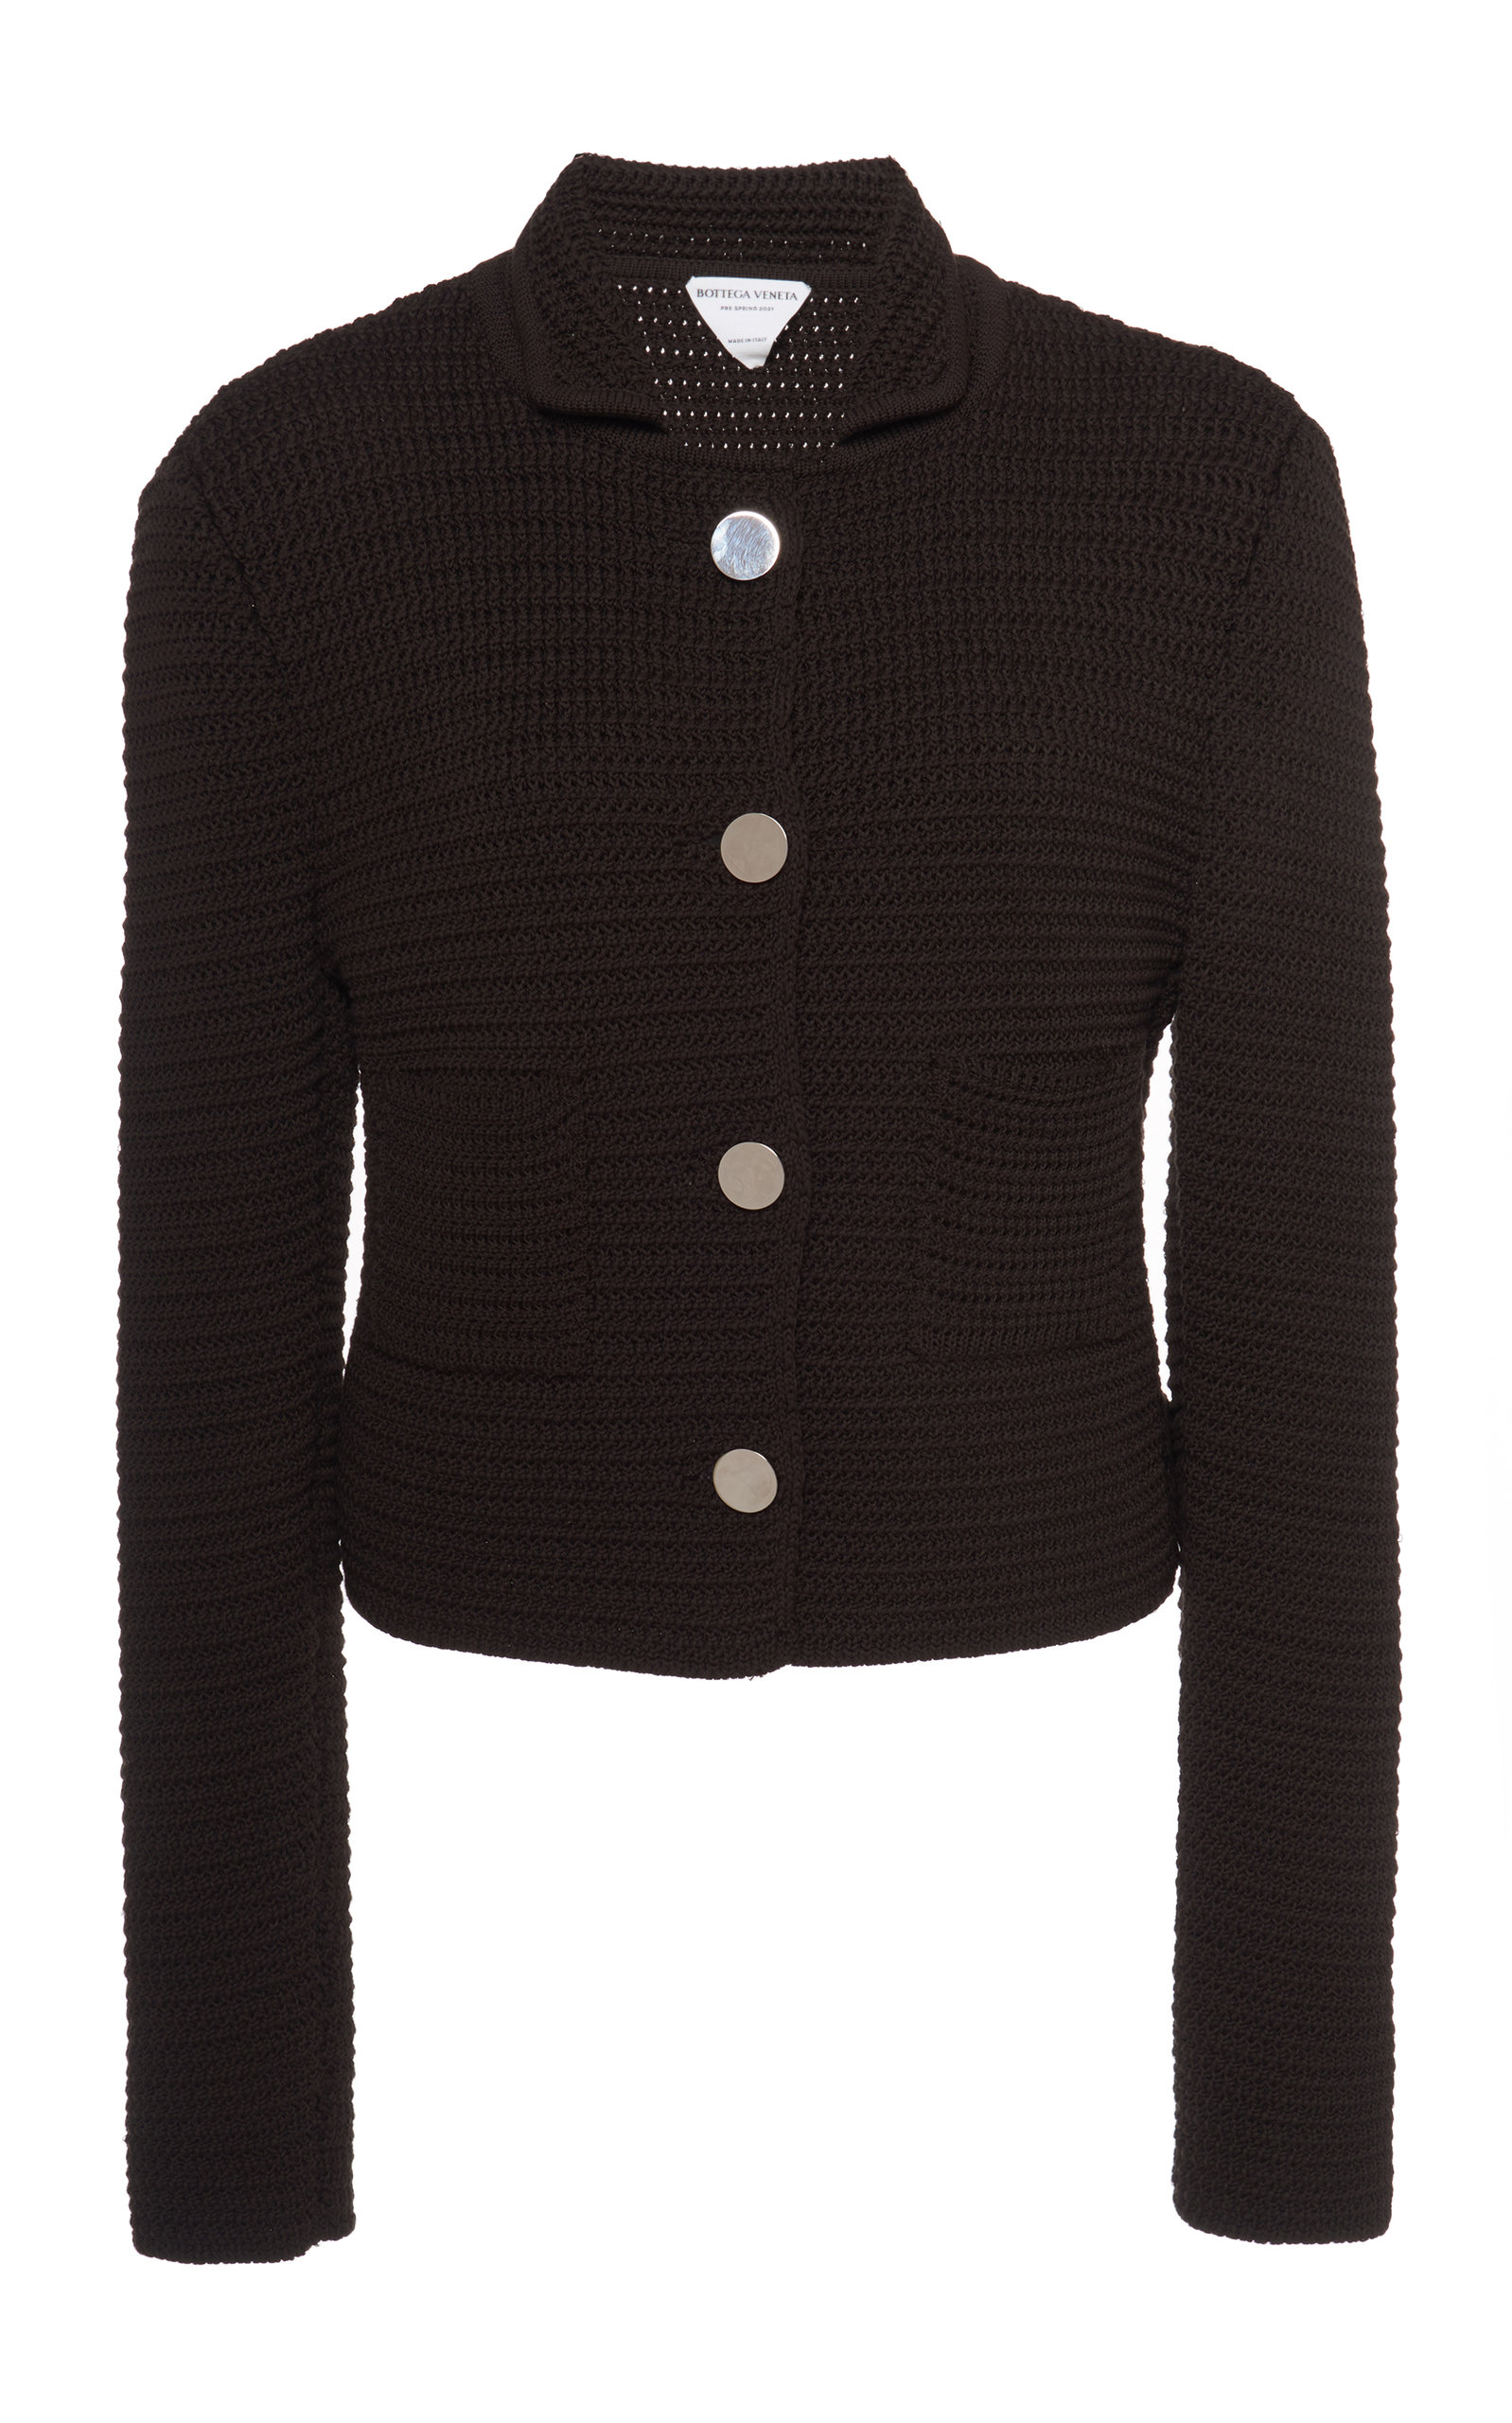 Bottega Veneta – Women's Cotton-Blend Knit Cardigan Jacket – Brown – Moda Operandi